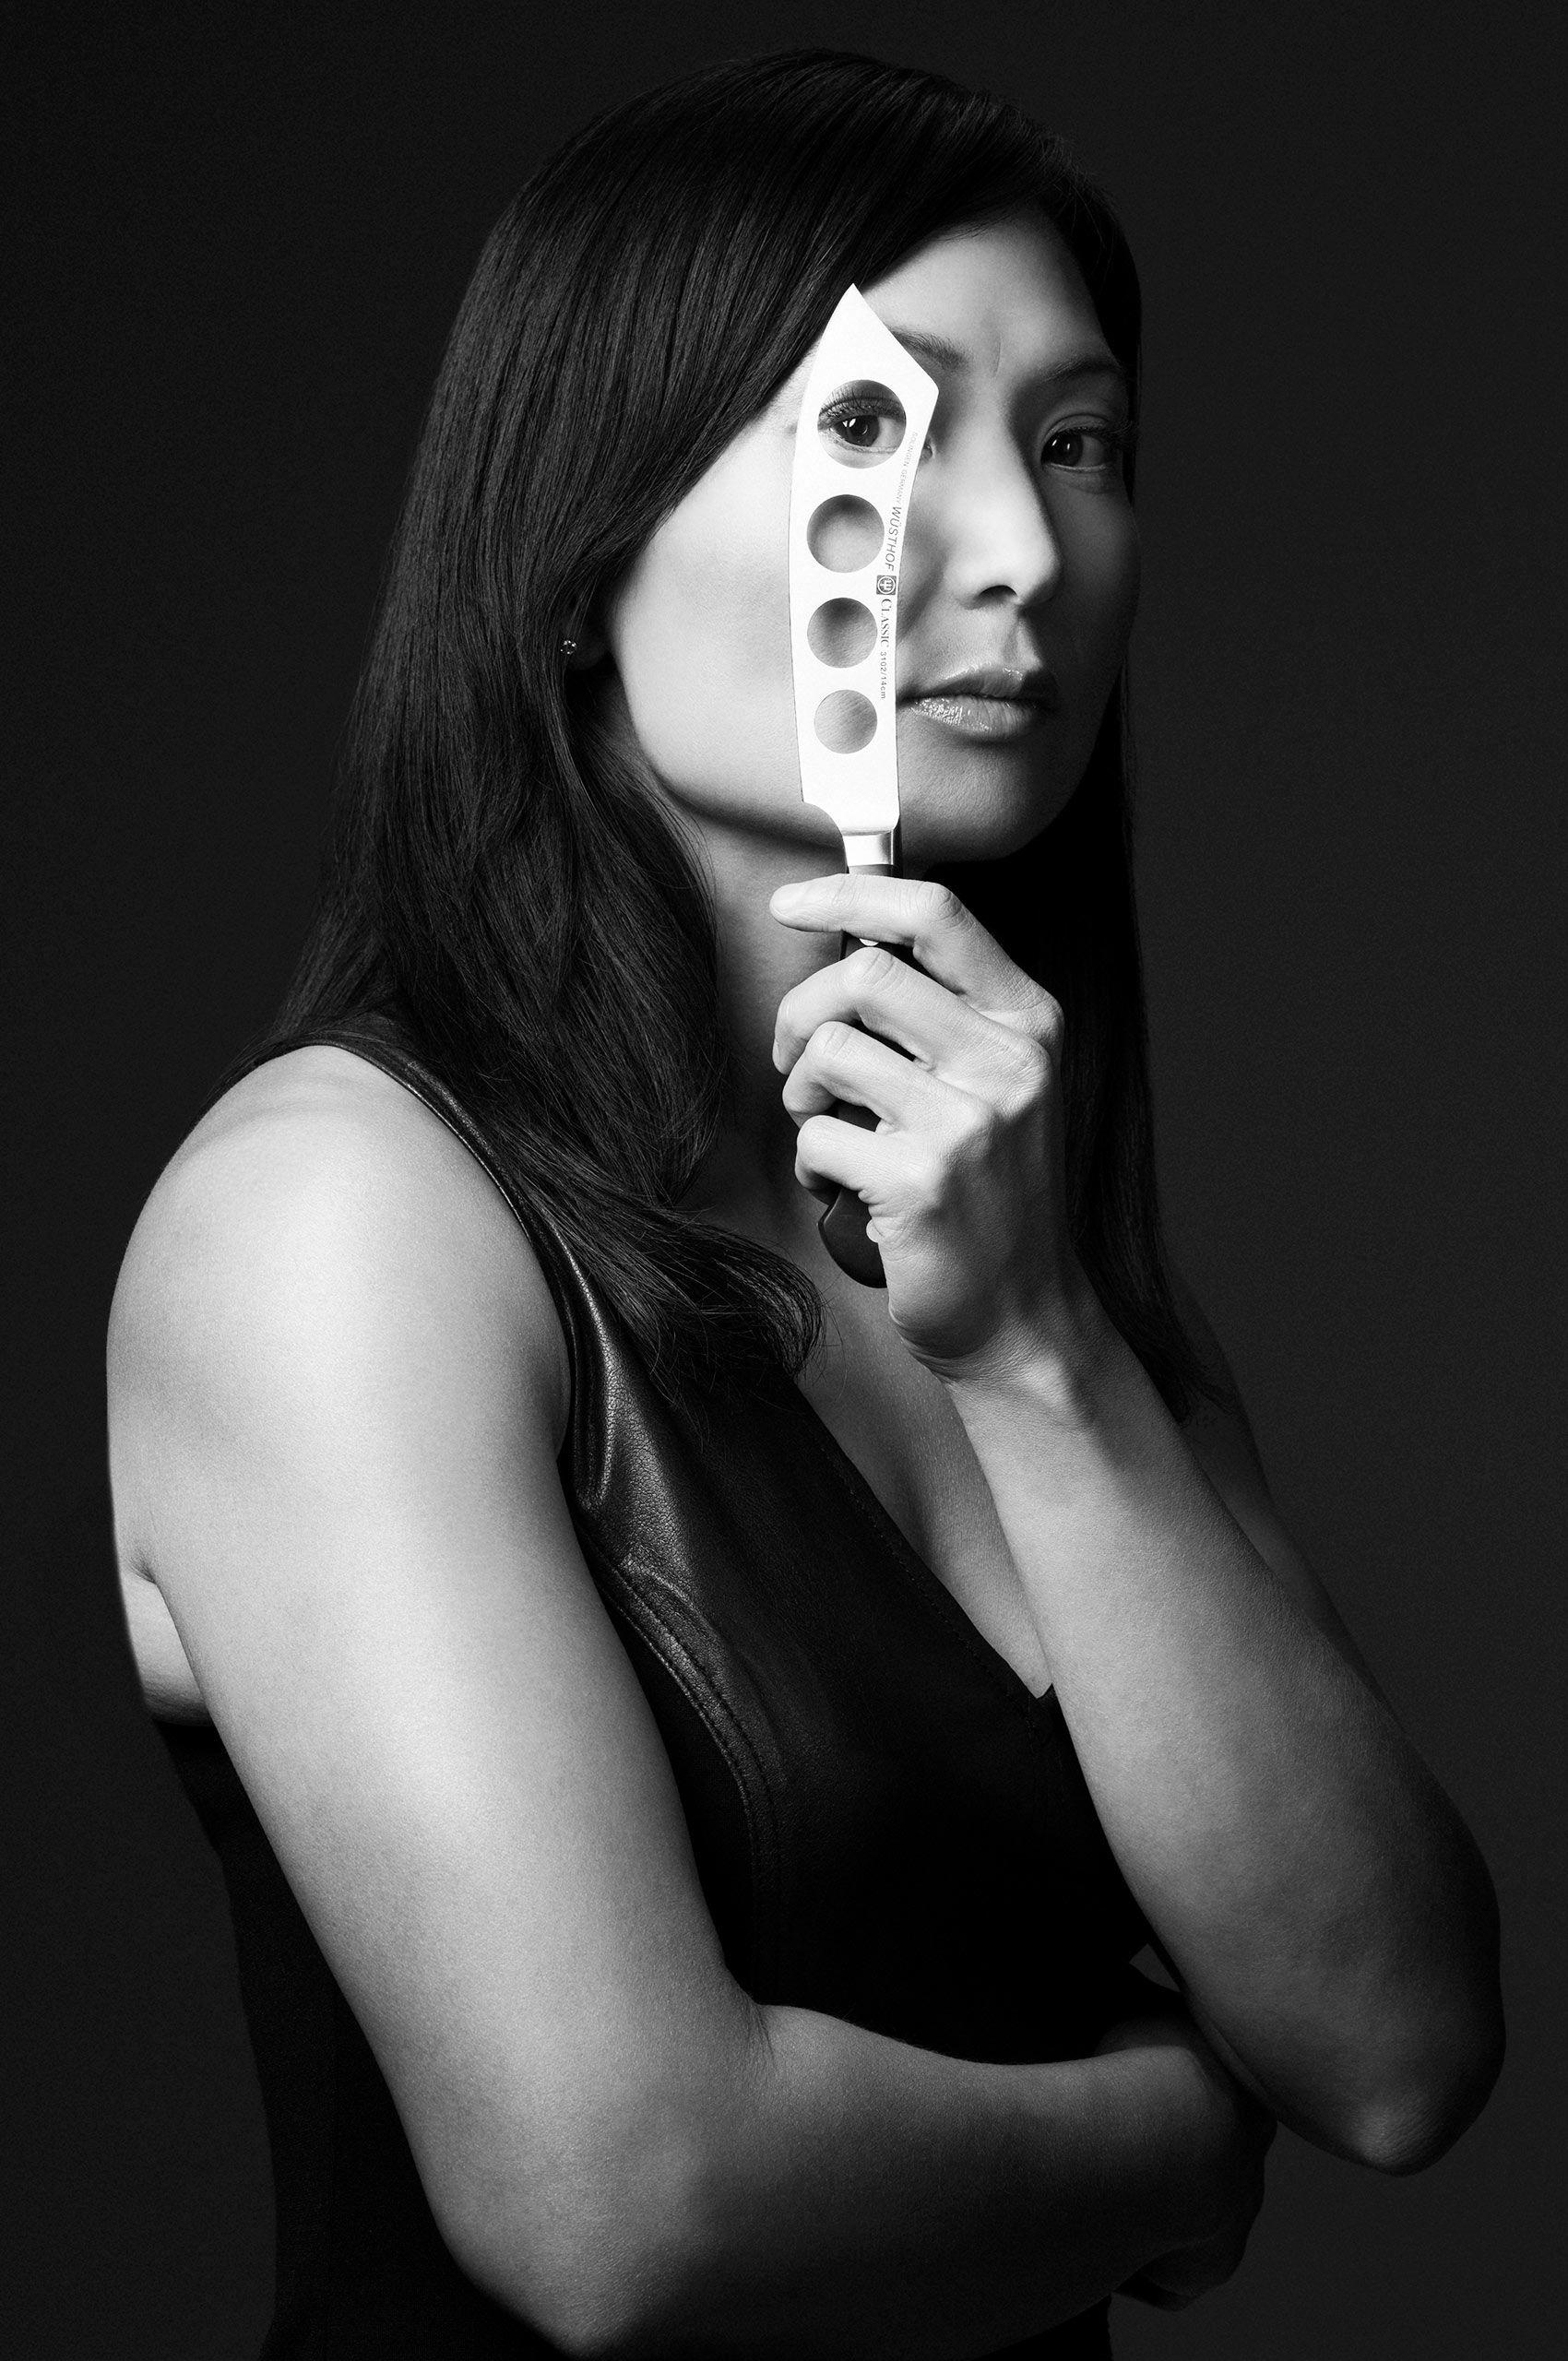 Ann-Kim-by-Henrik-Olund-Photography.jpg